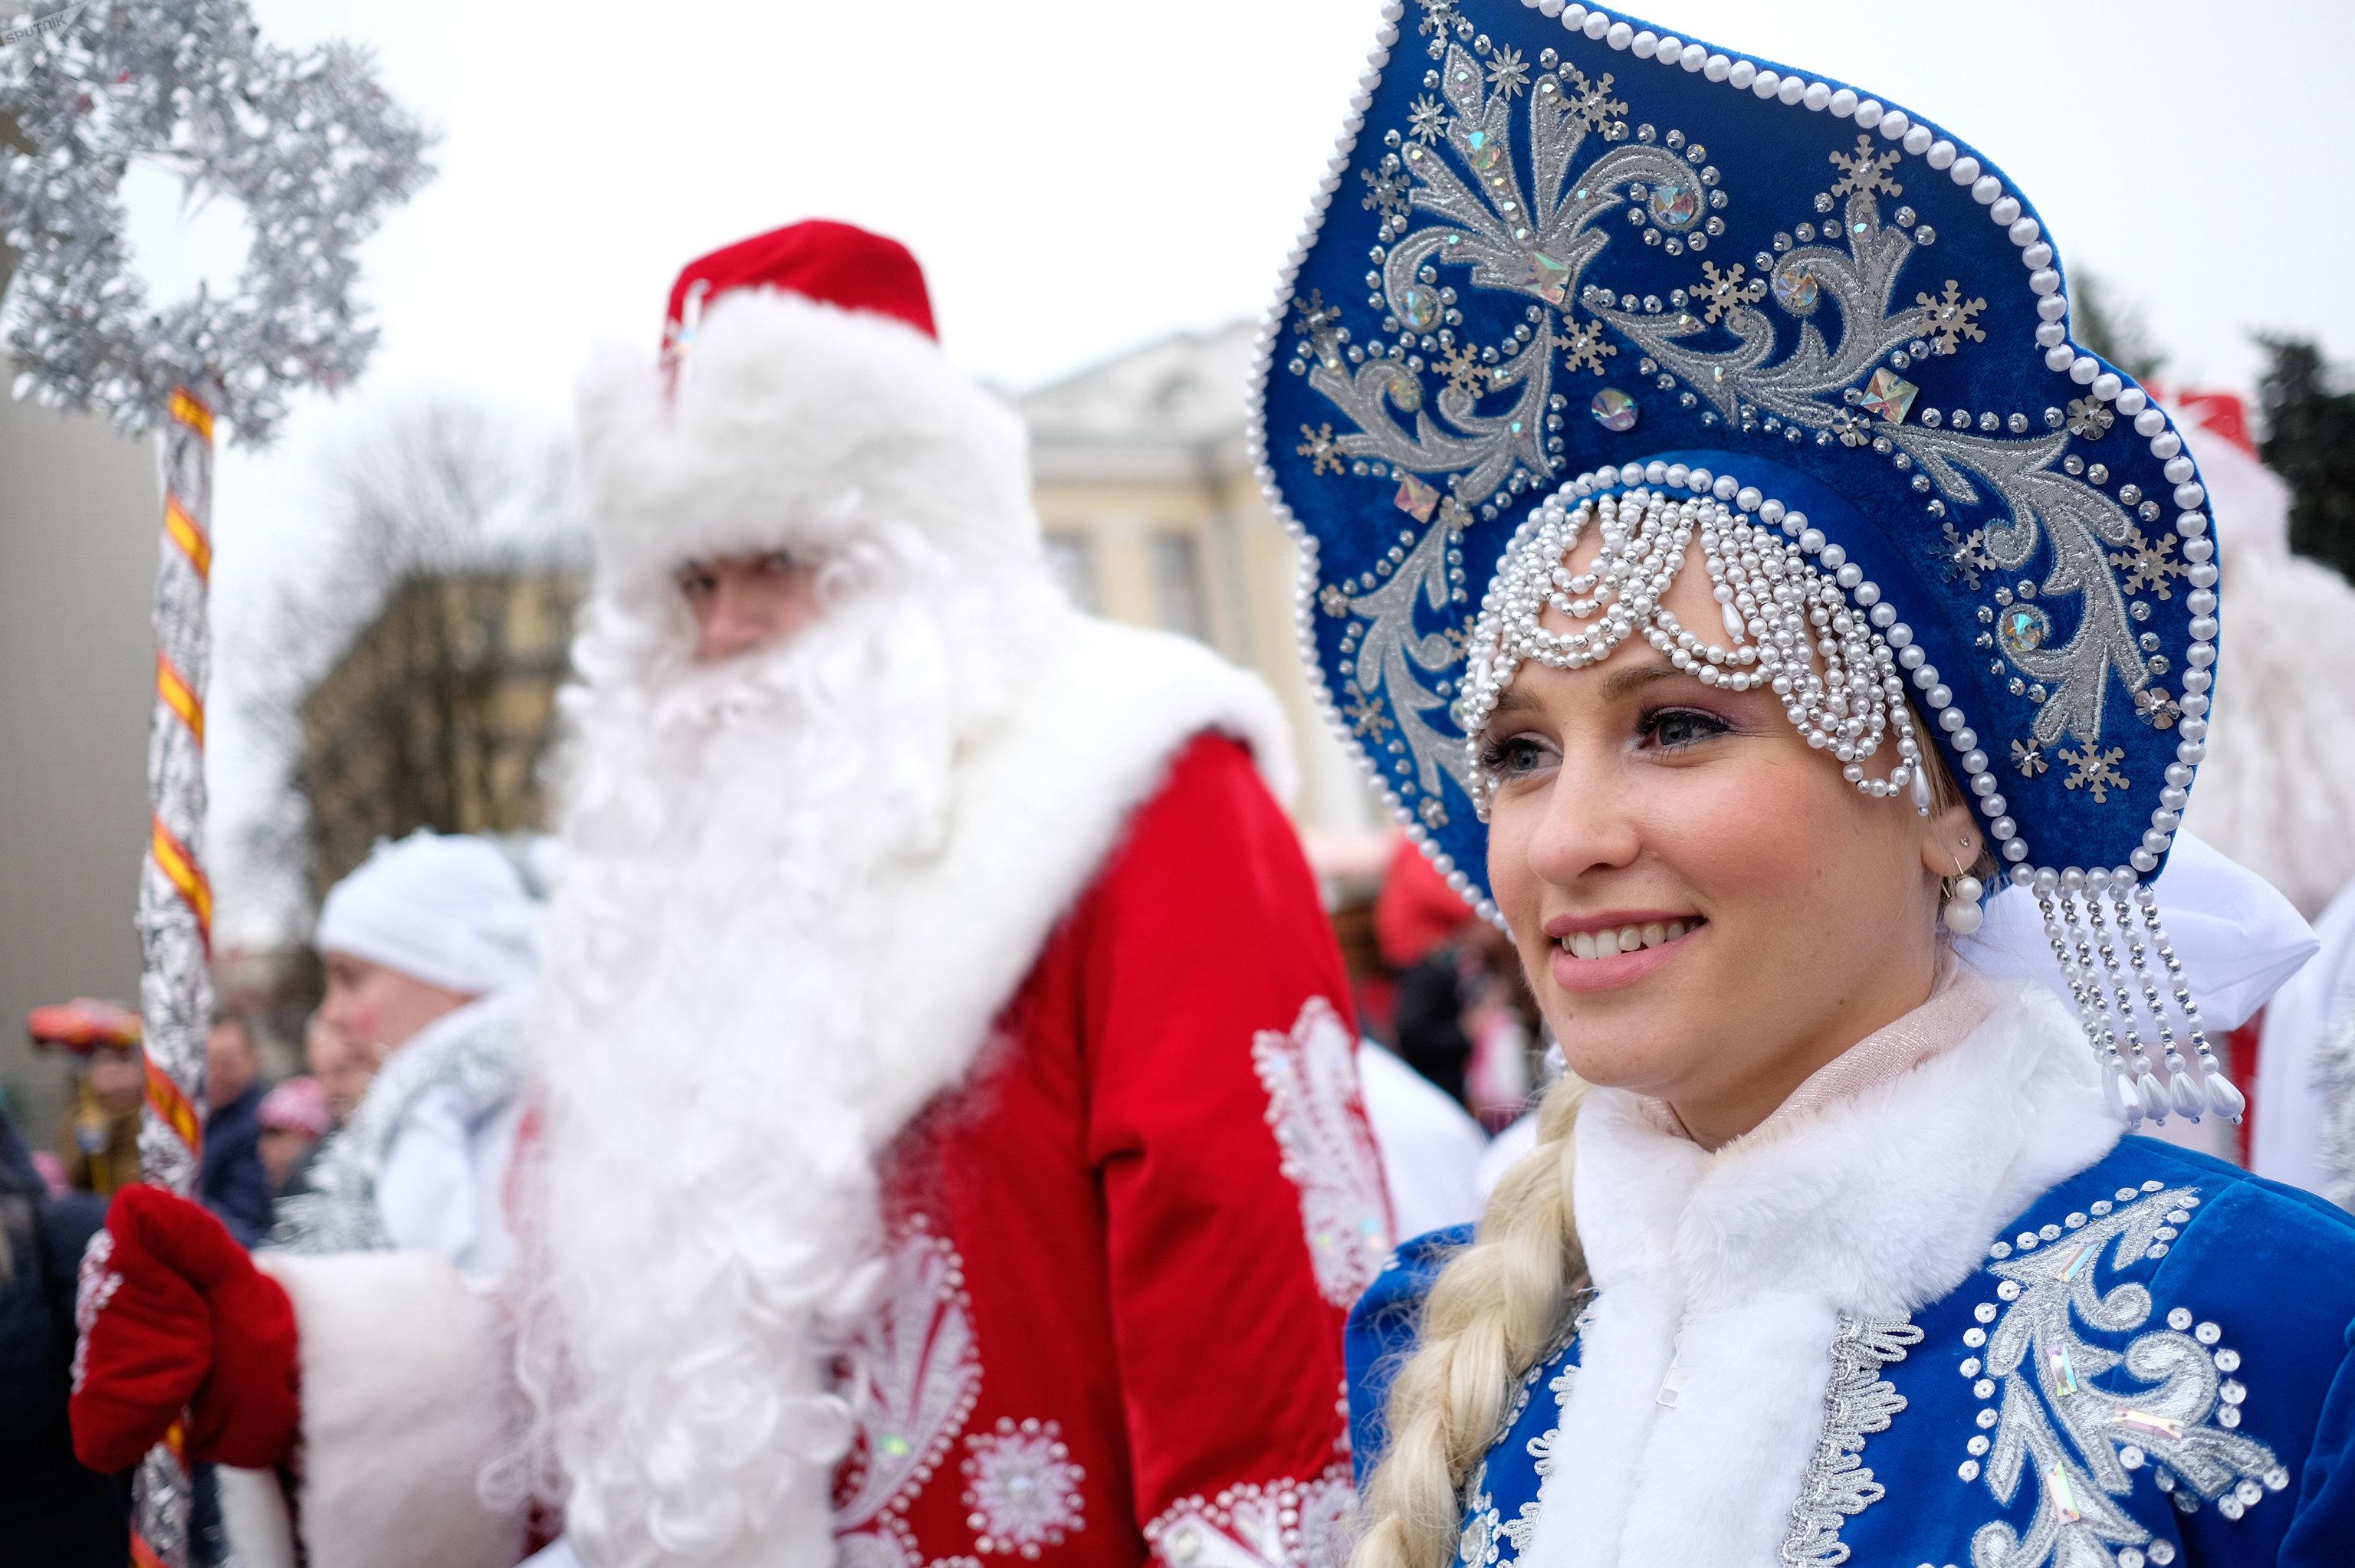 Ded Moroz et sa petite-fille Snegourotchka (Fille de neige)